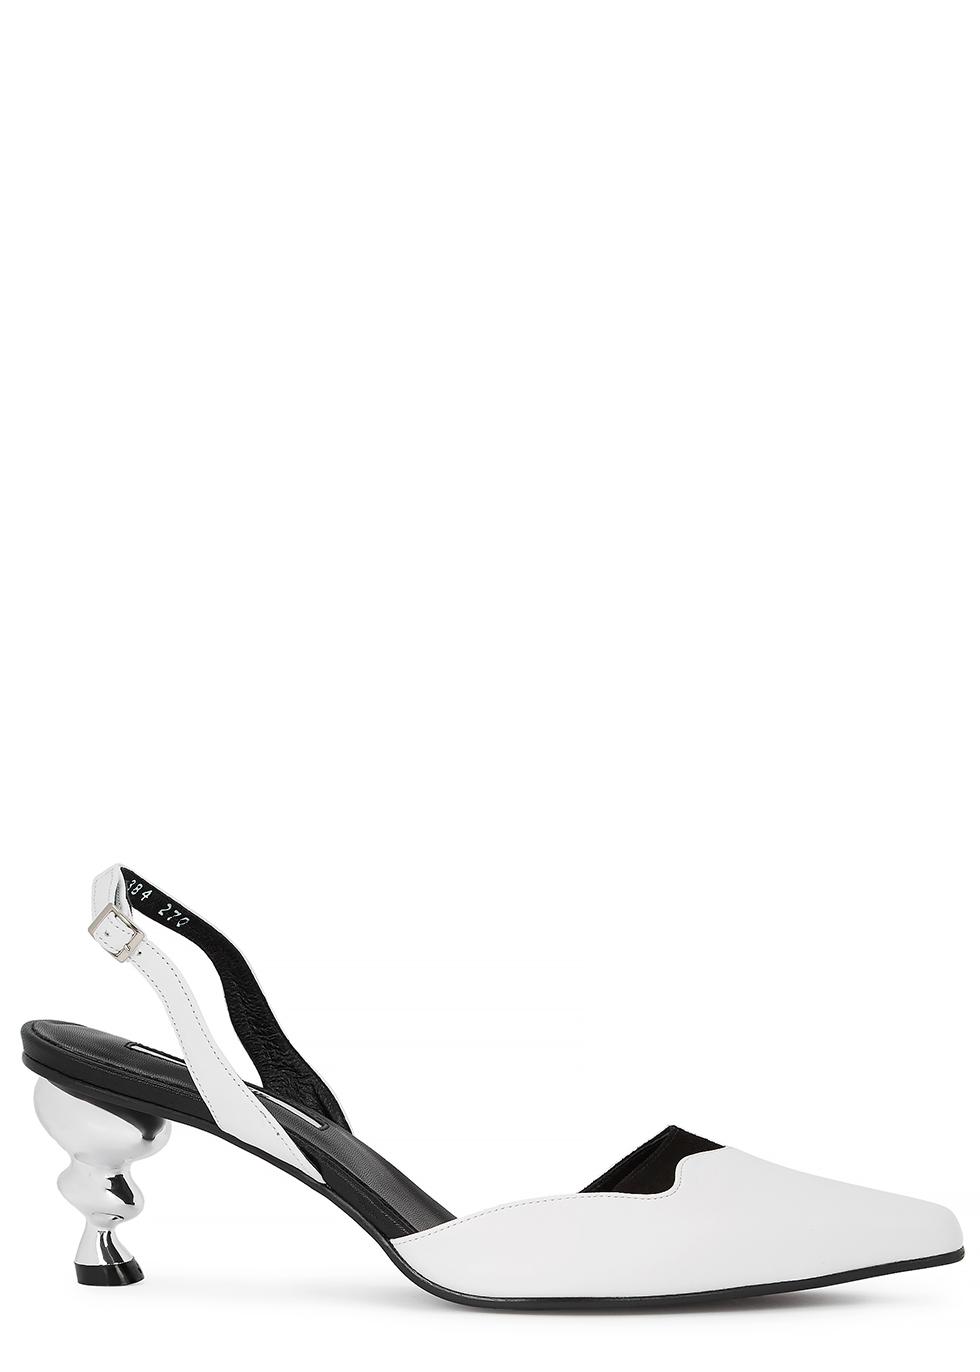 6e6c3ad7c New Women's Designer Shoes and Boots - Harvey Nichols